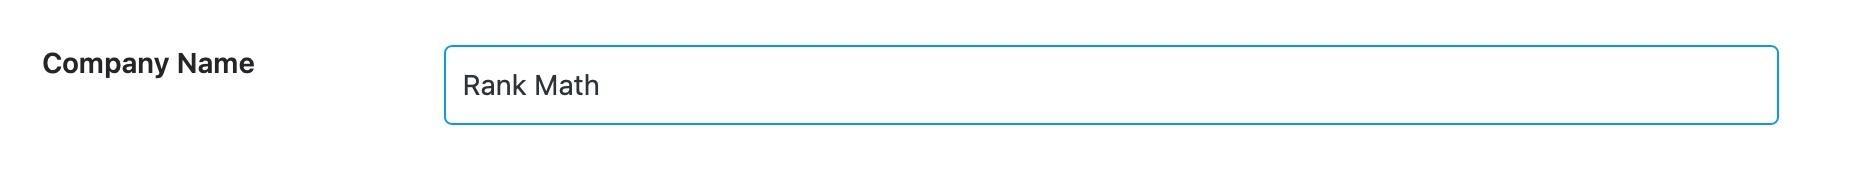 Rank Math Setup Wizard - Company Name option